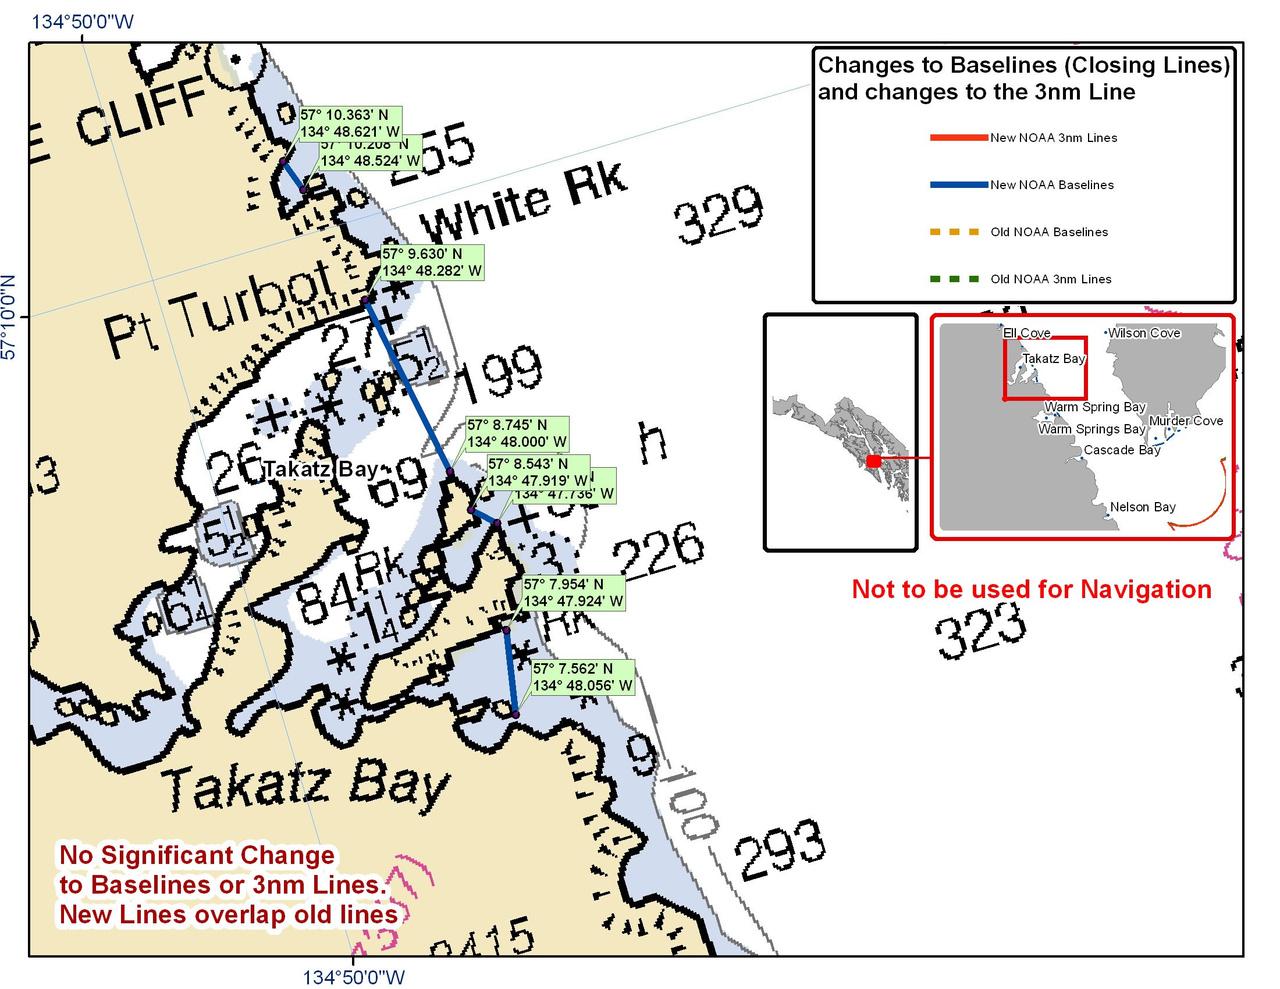 Chart for Takatz Bay